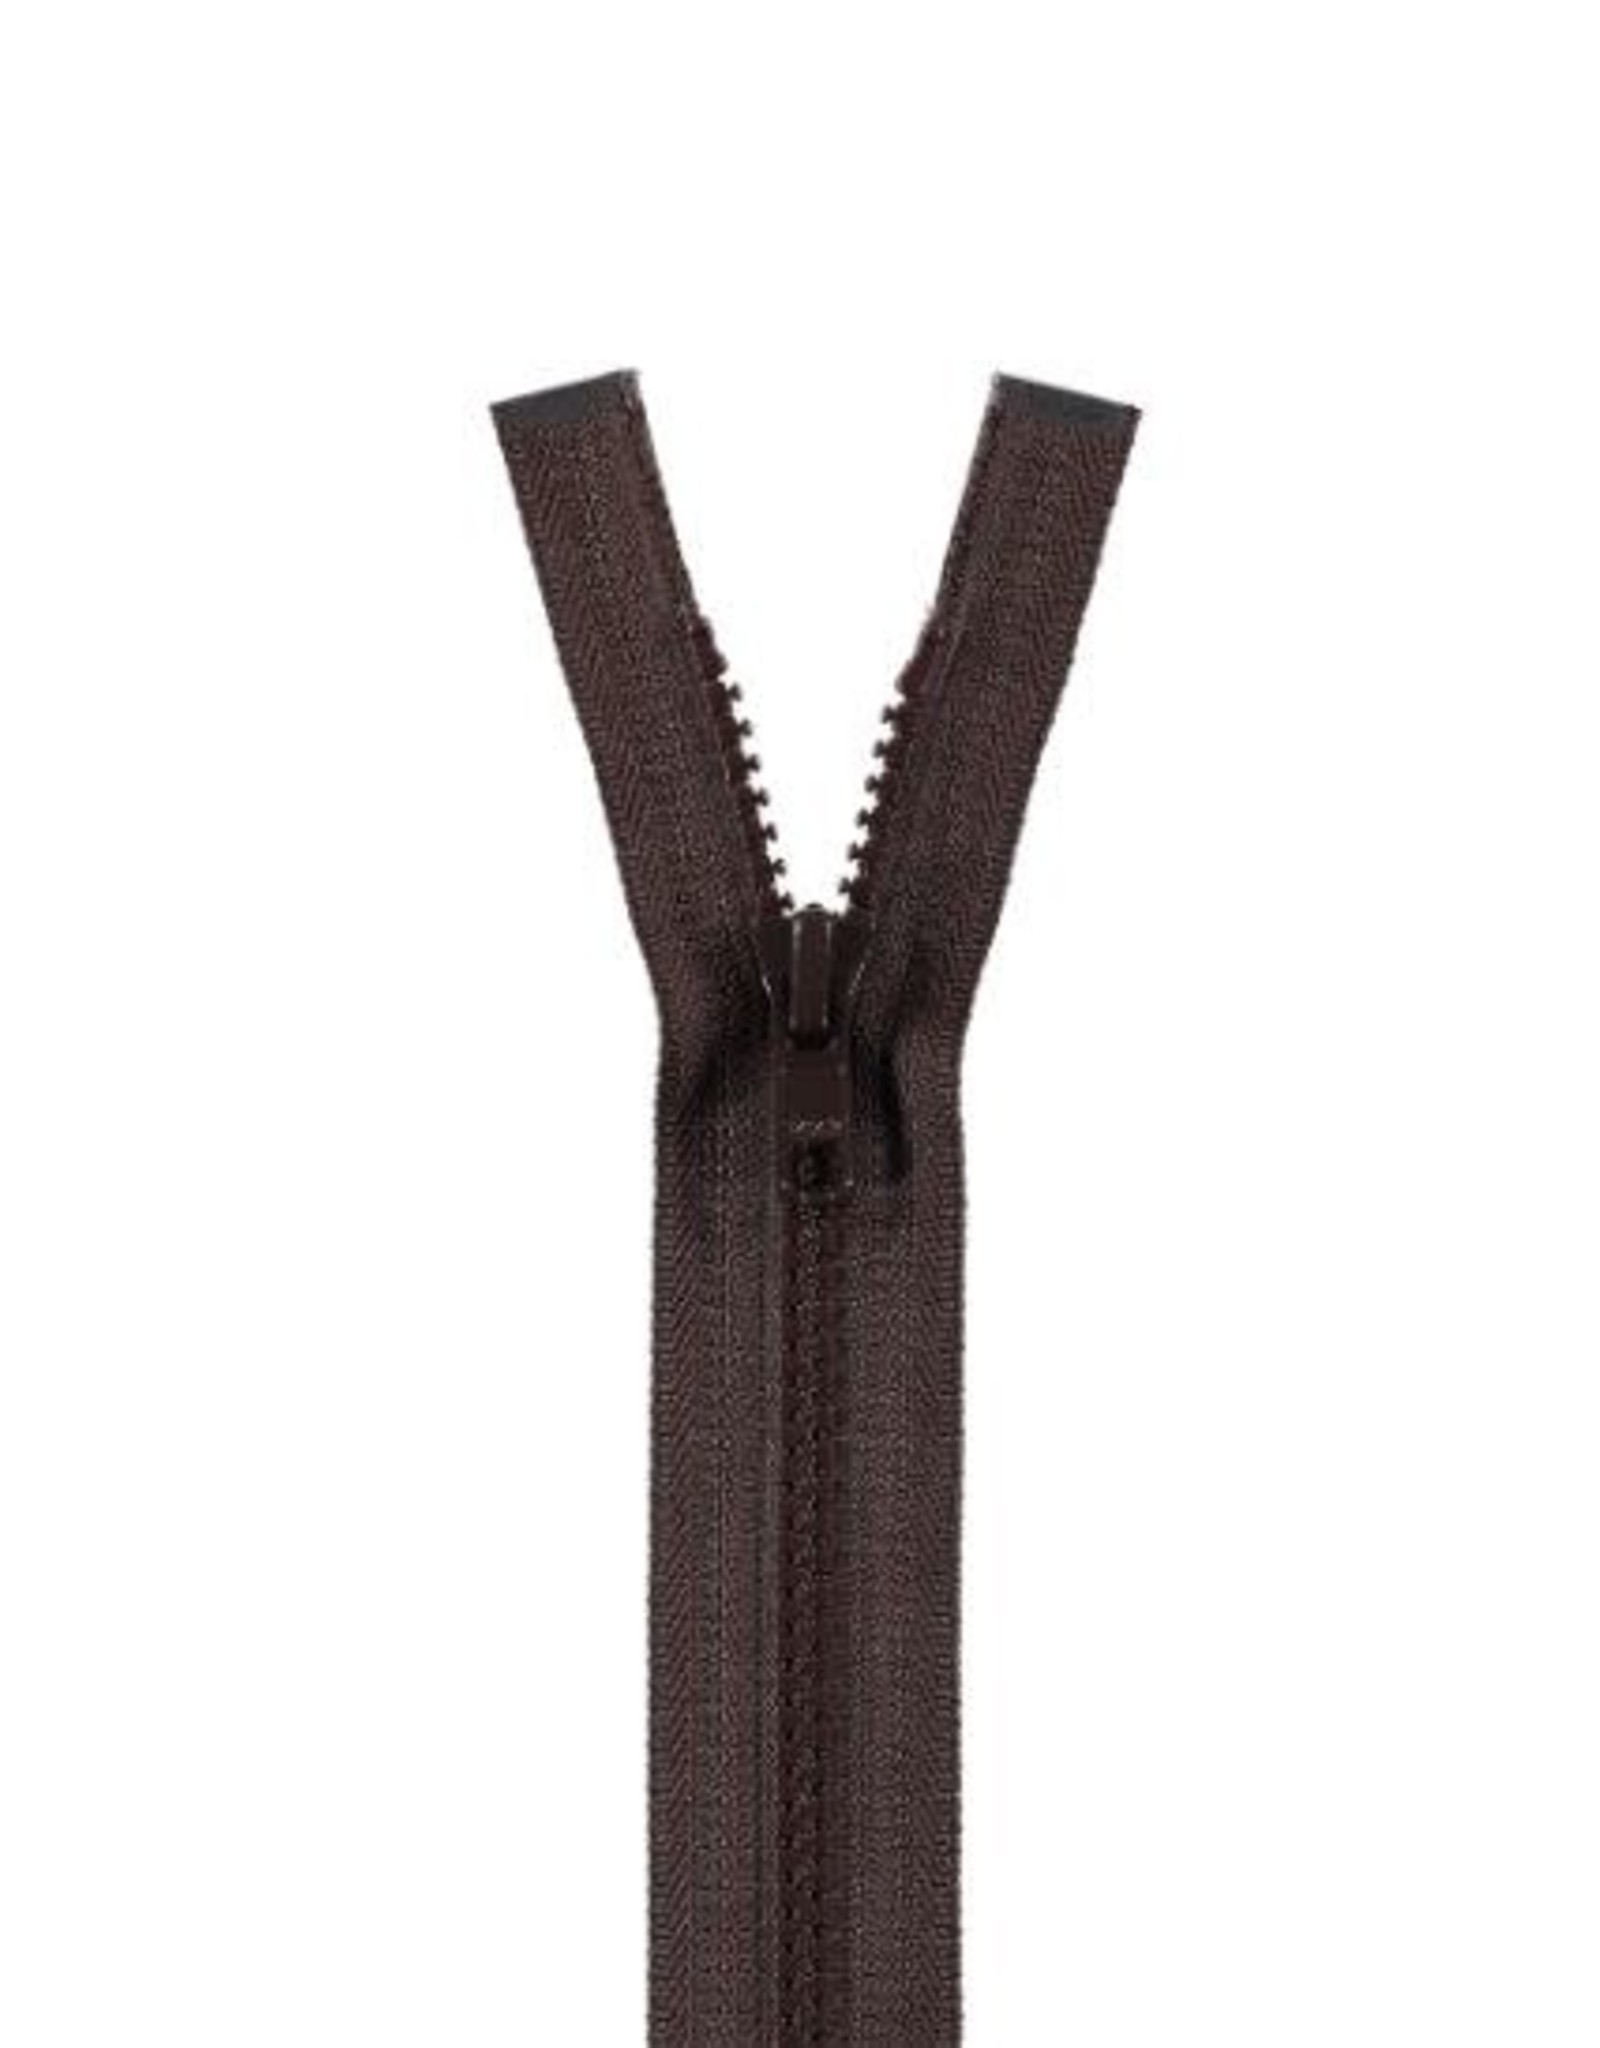 YKK BLOKRITS 5 DEELBAAR bruin 570-60cm